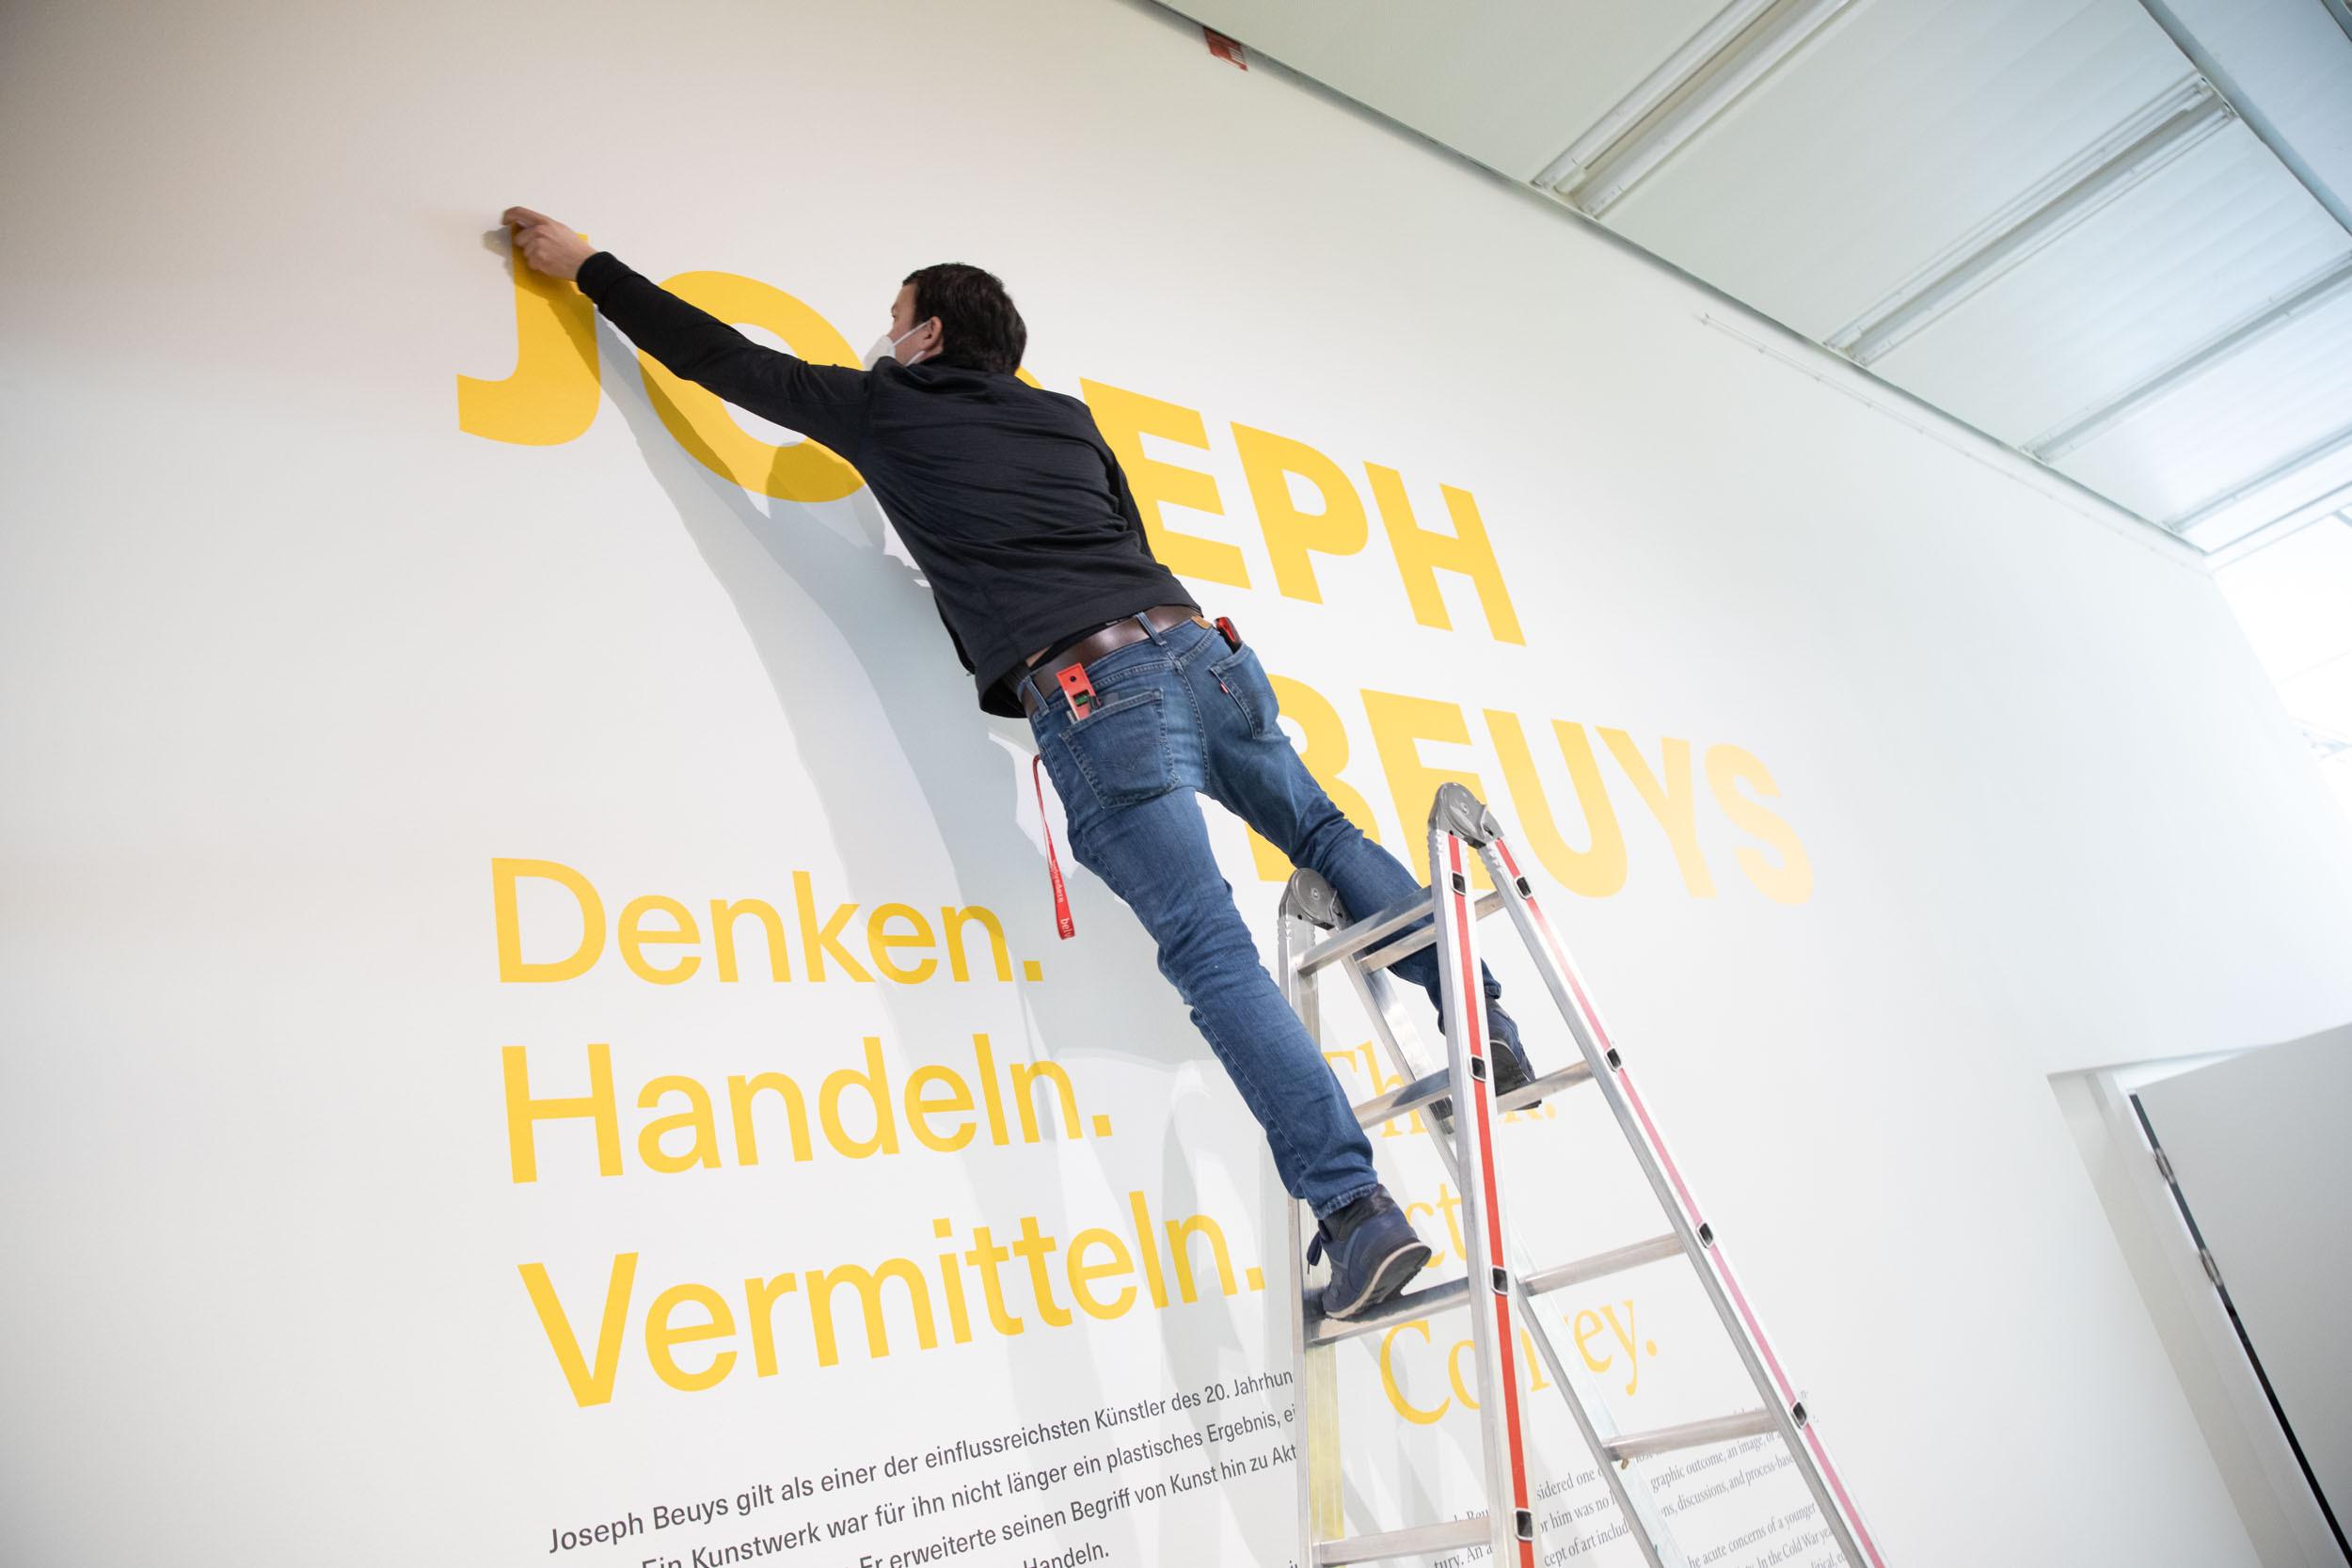 eSeL Foto: Joseph Beuys - Denken. Handeln. Vermitteln (Belvedere21, 4.3. - 13.6.2021)